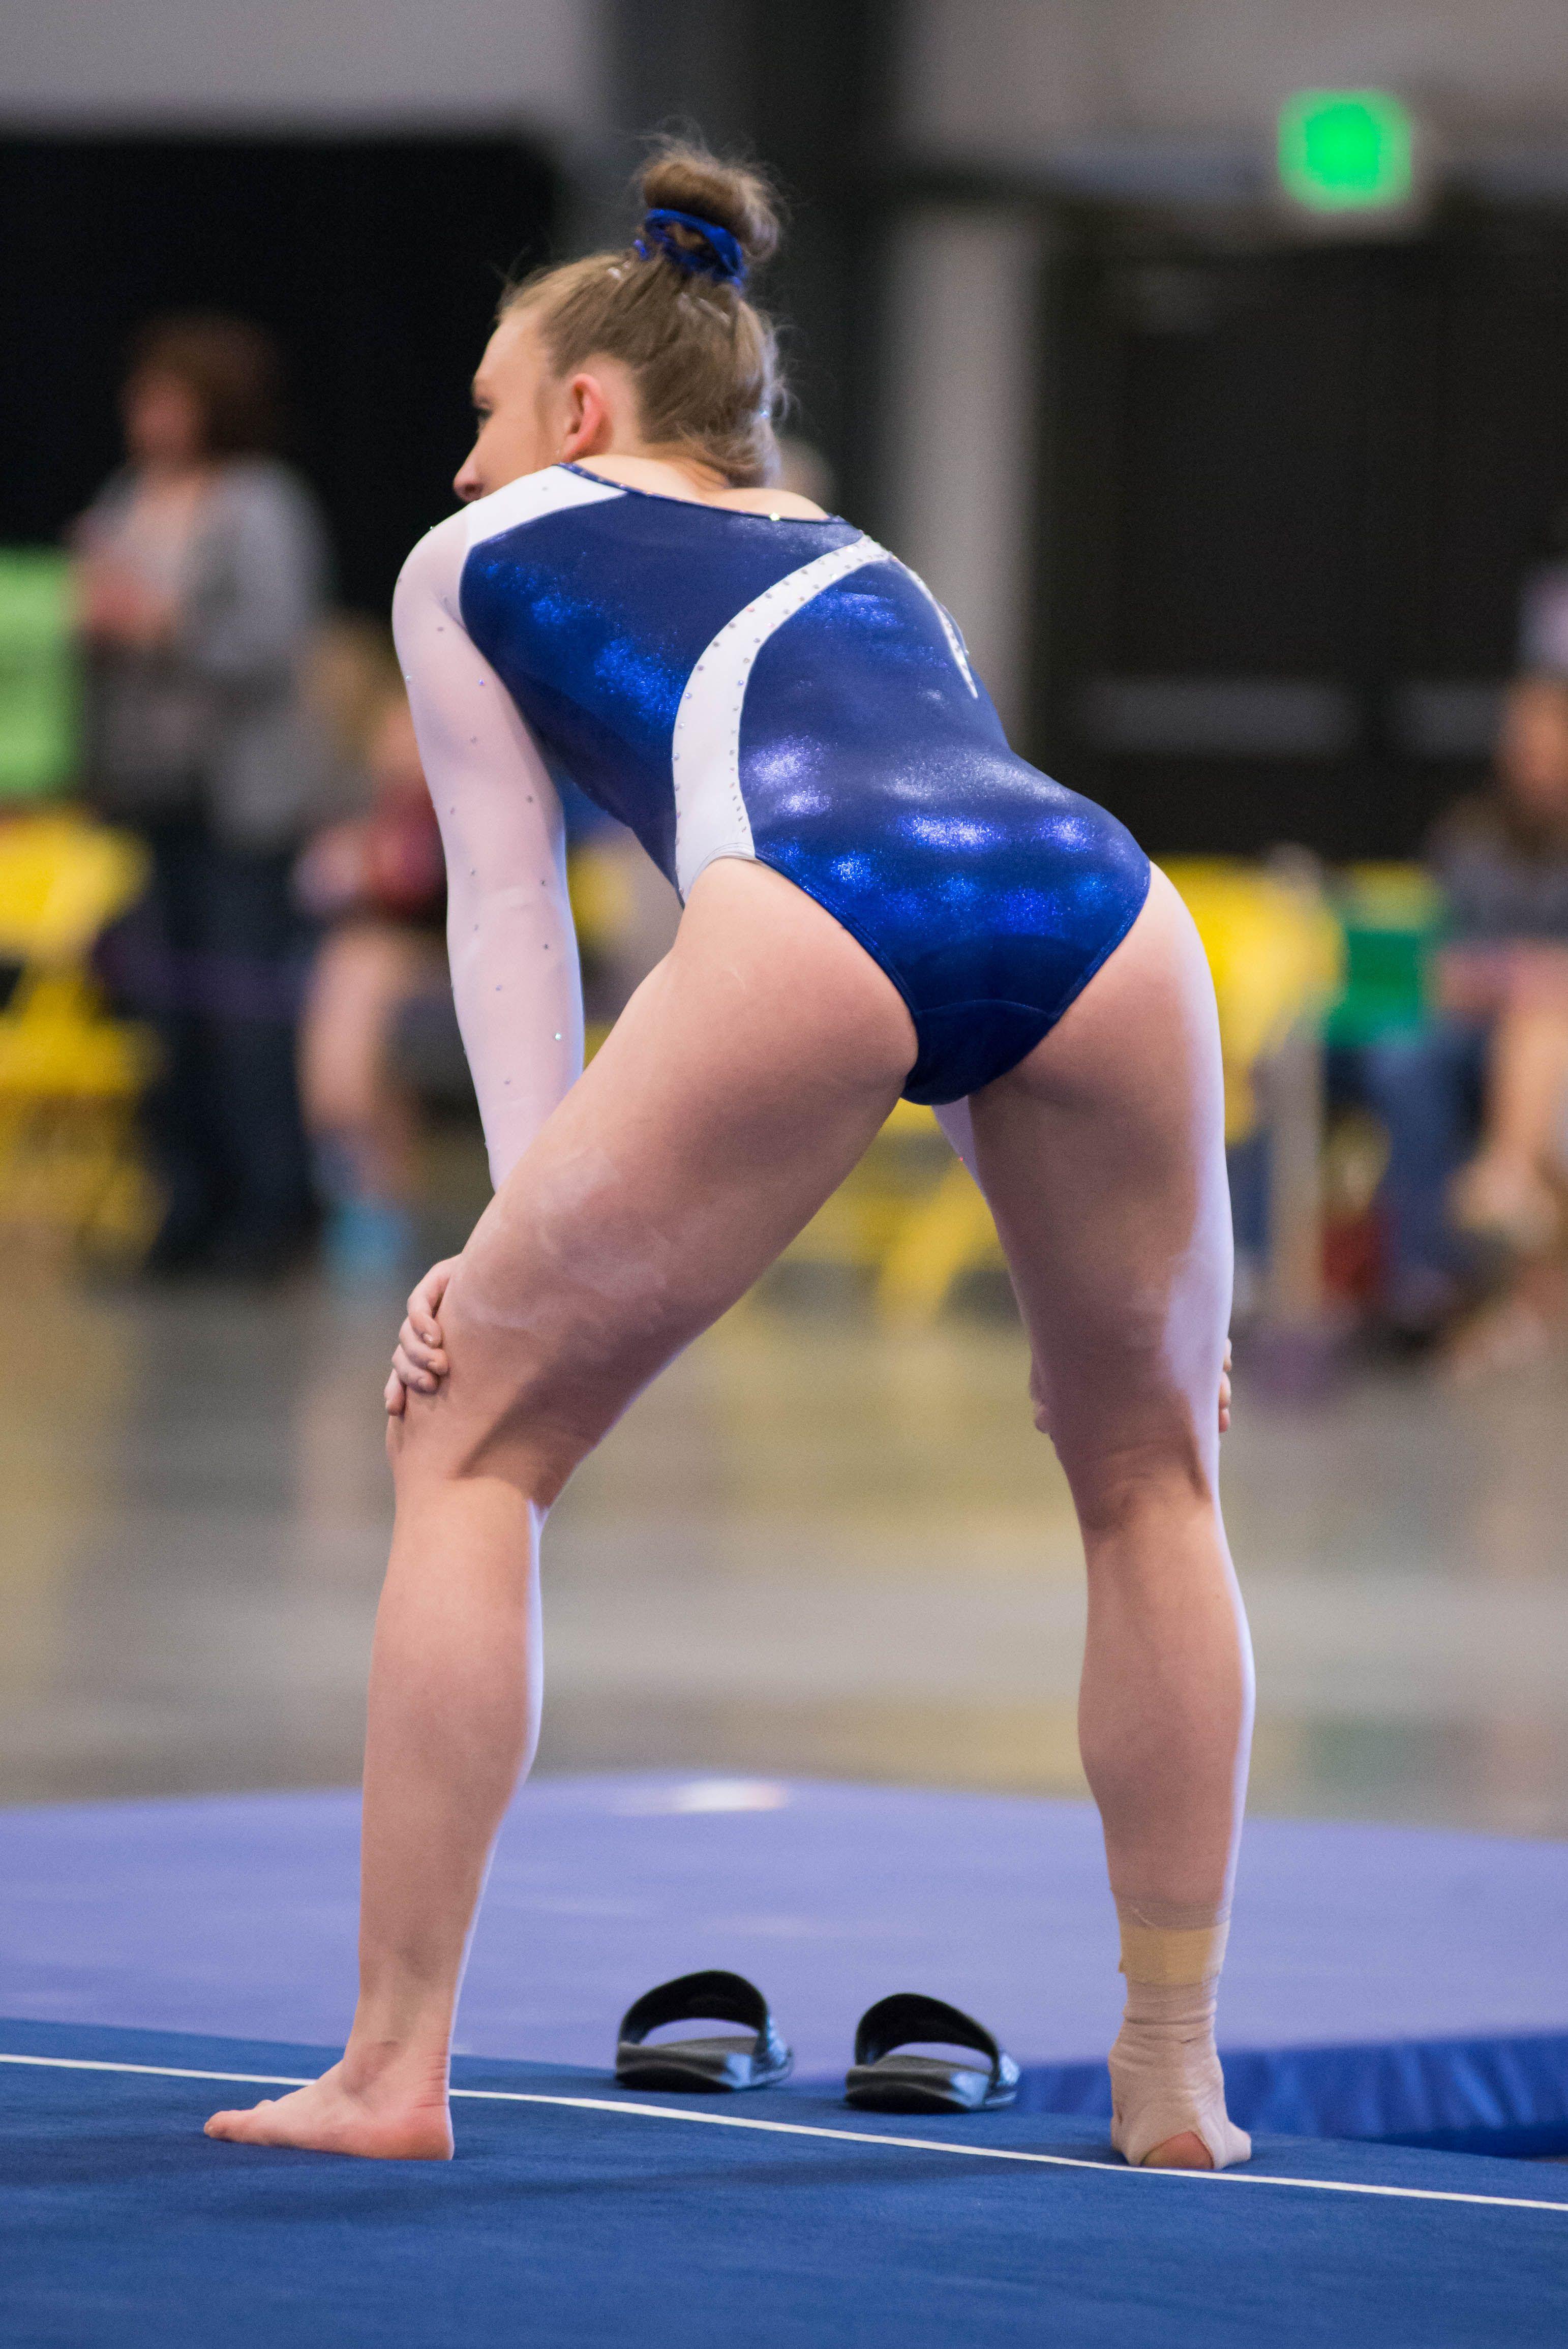 Female Gymnastics, Resolution 3084X4620, From Chollajack -6957